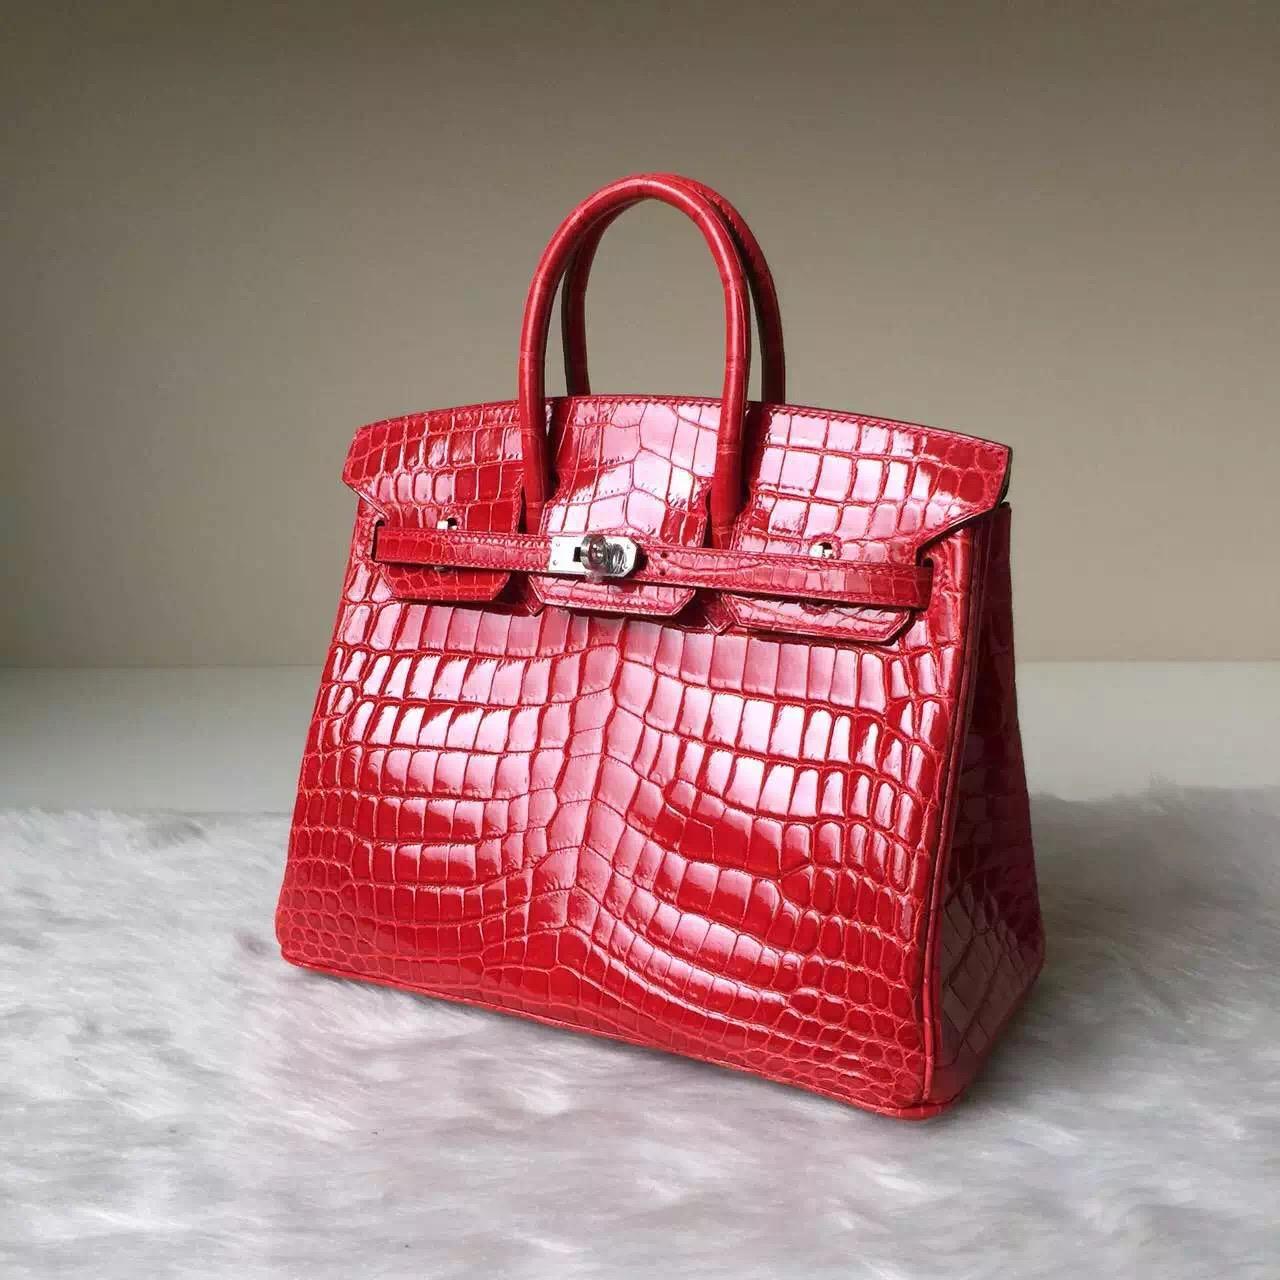 Wholesale Hermes Crocodile Shiny Leather Birkin Bag 25cm in CK95 Ferrari Red